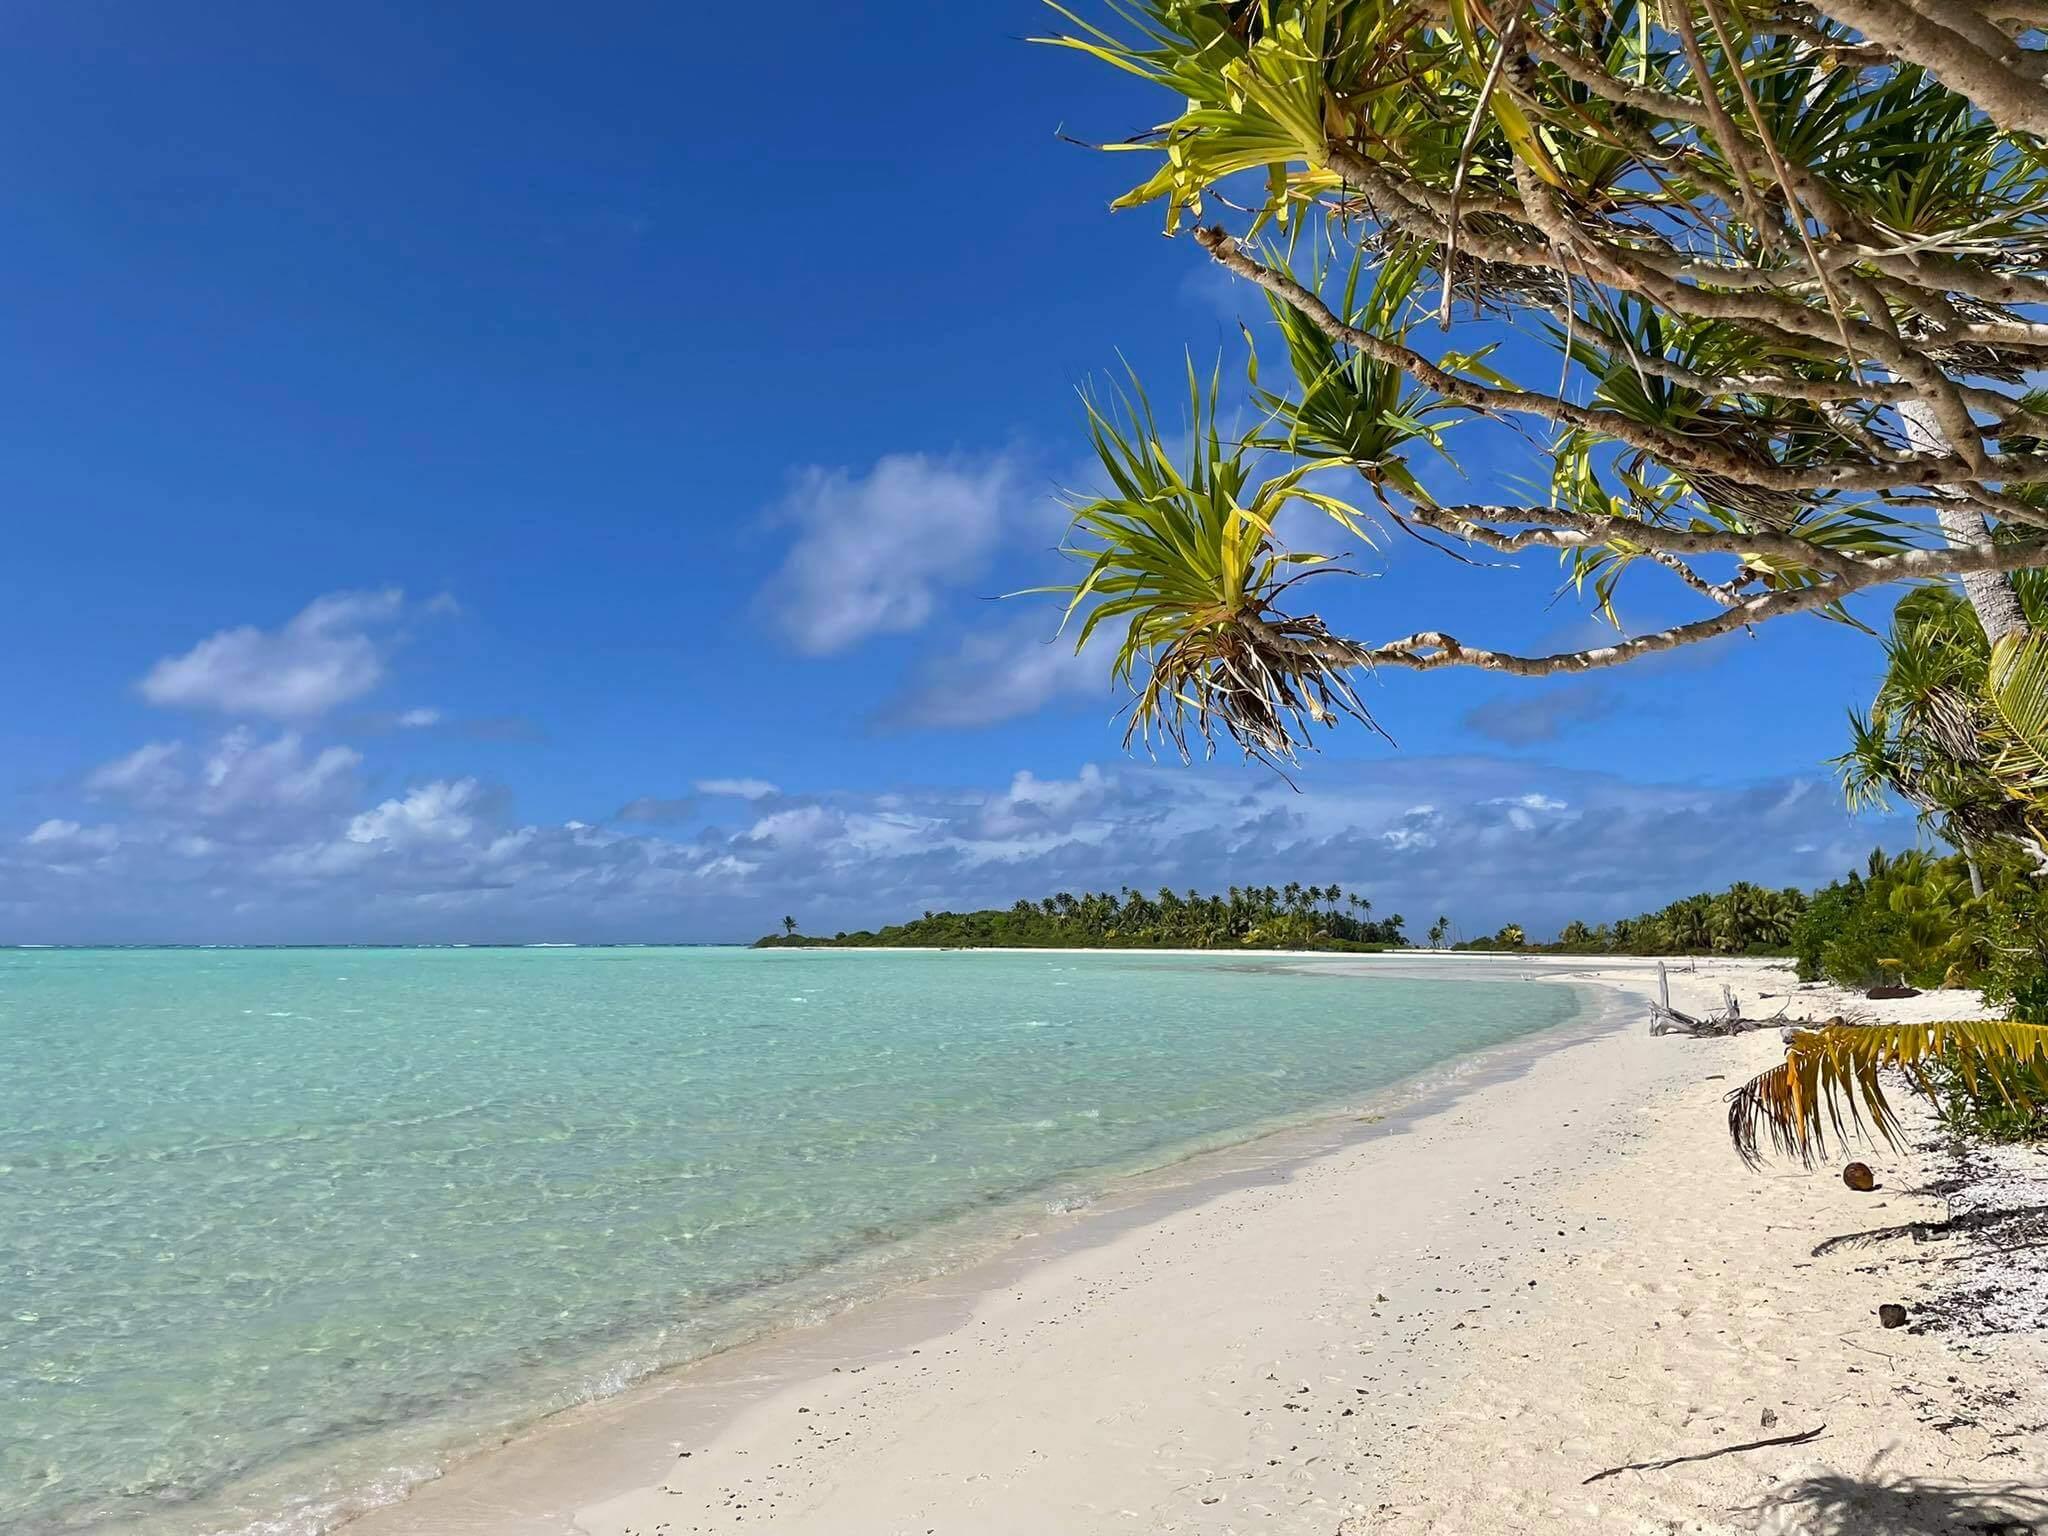 http://tahitivoileetlagon.com/wp-content/uploads/2021/07/plage-TETIAROA.jpg